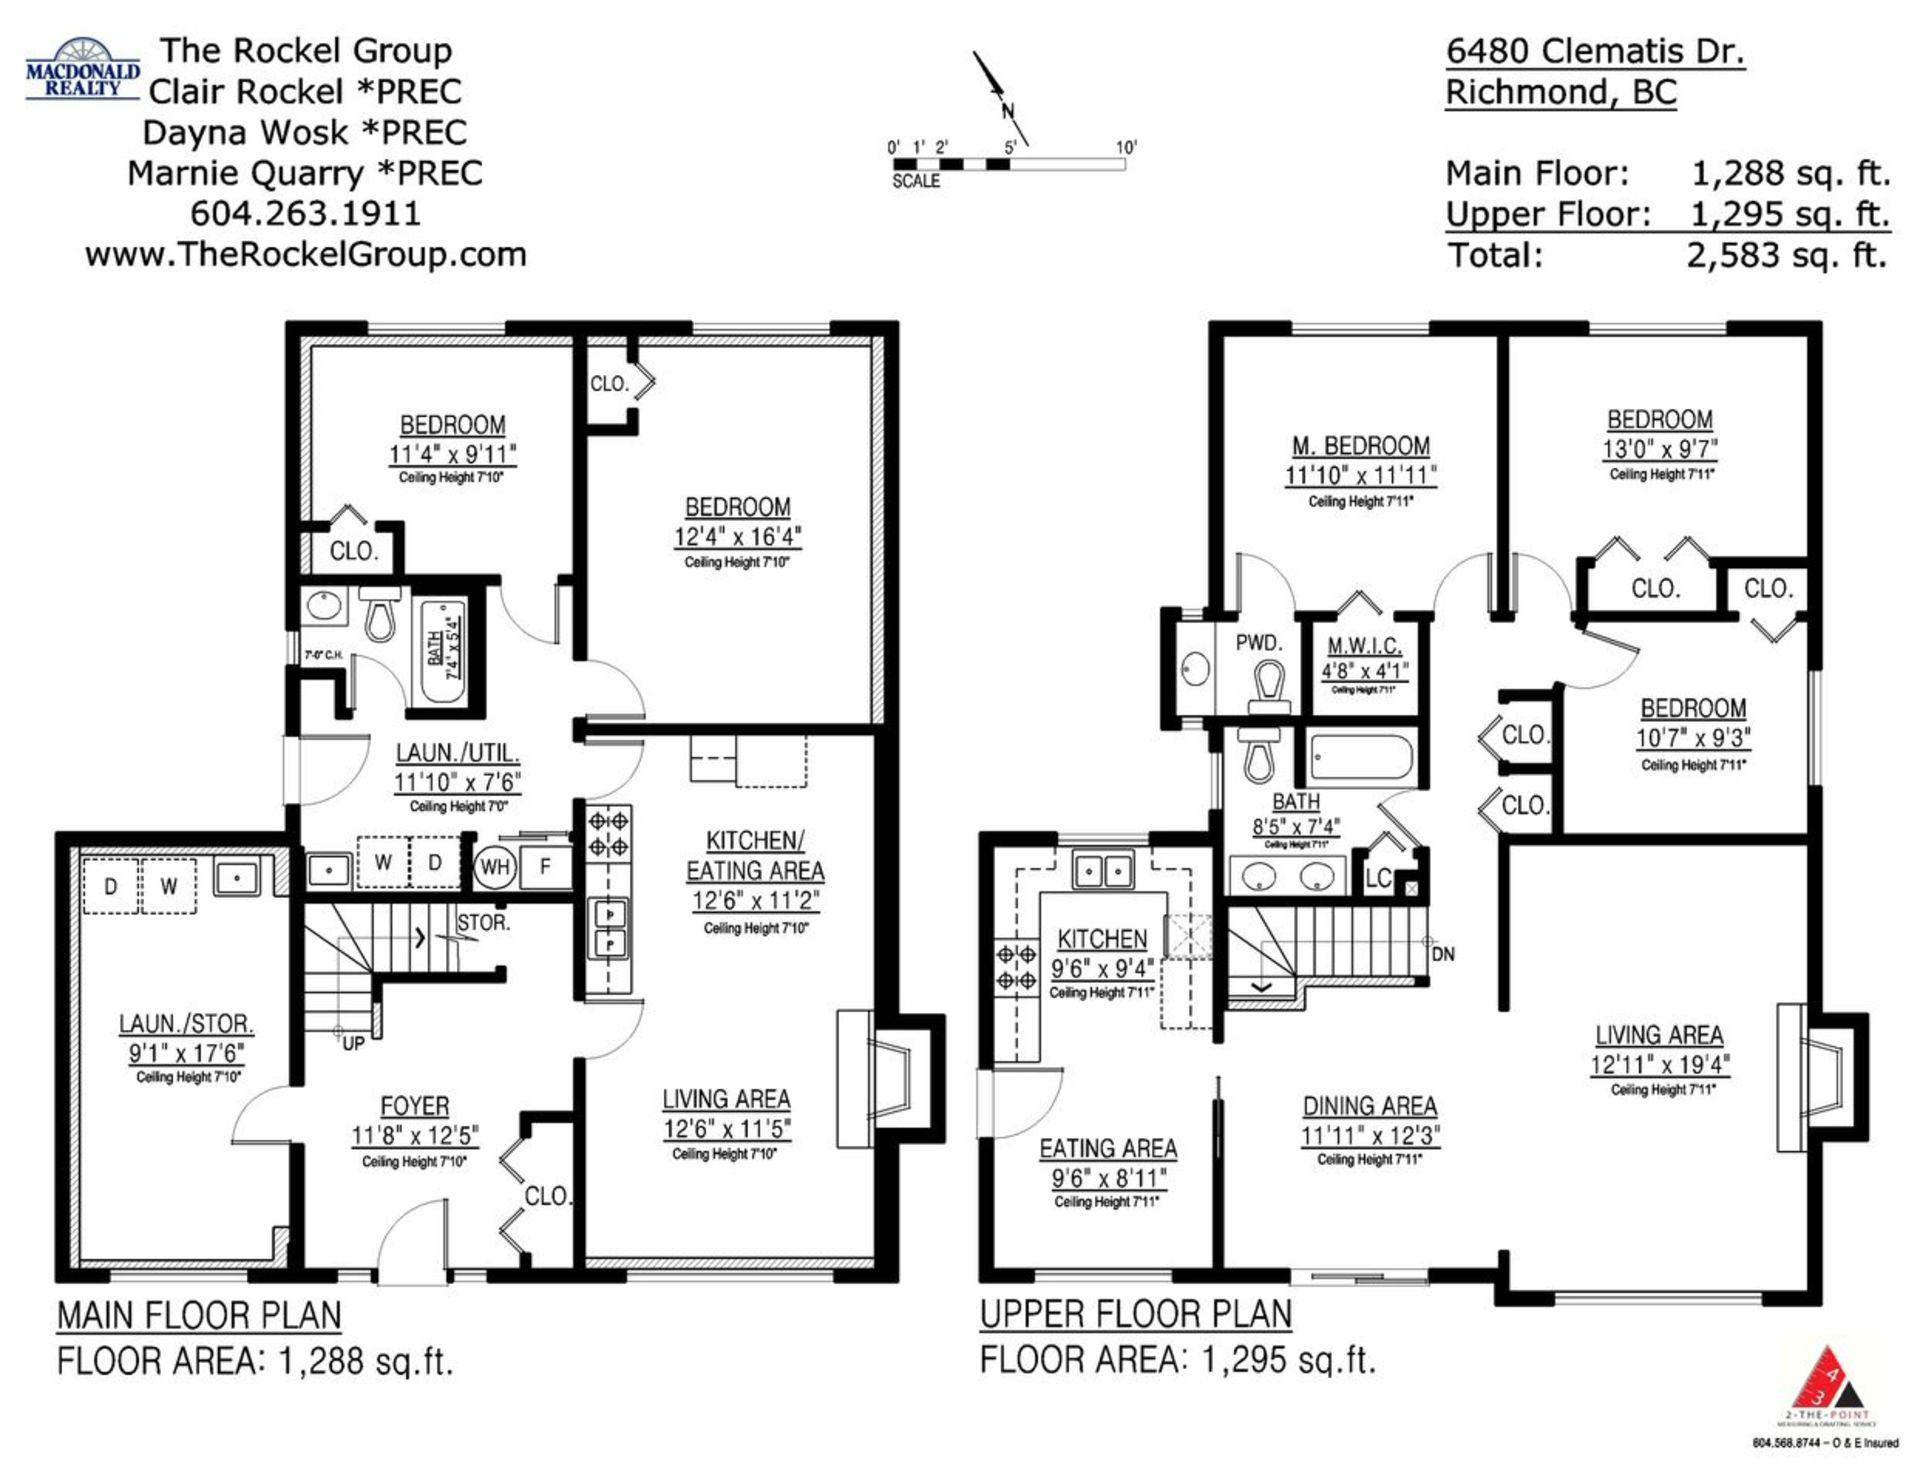 Floorplans at 6480 Clematis Drive, Riverdale RI, Richmond